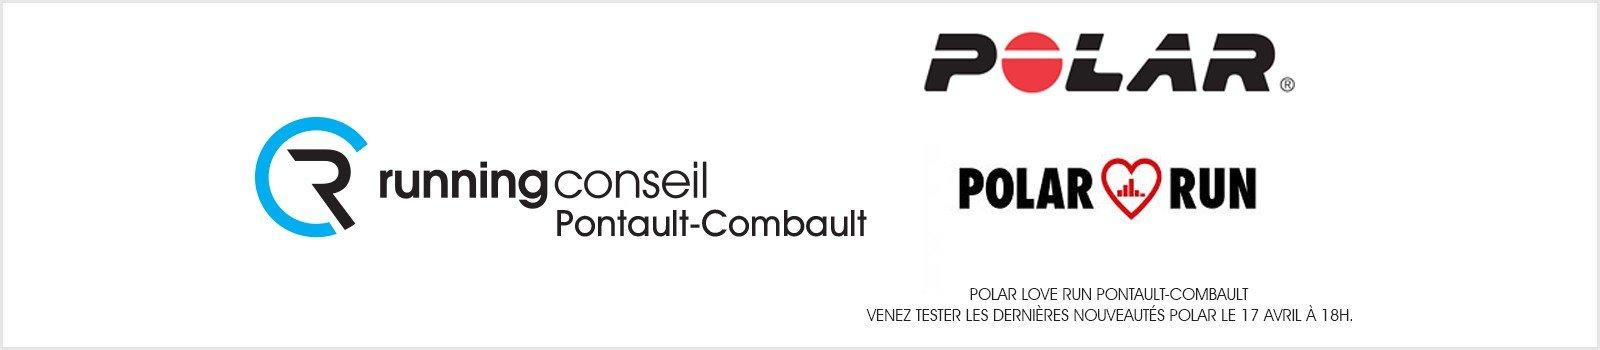 POLAR LOVE RUN PONTAULT-COMBAULT